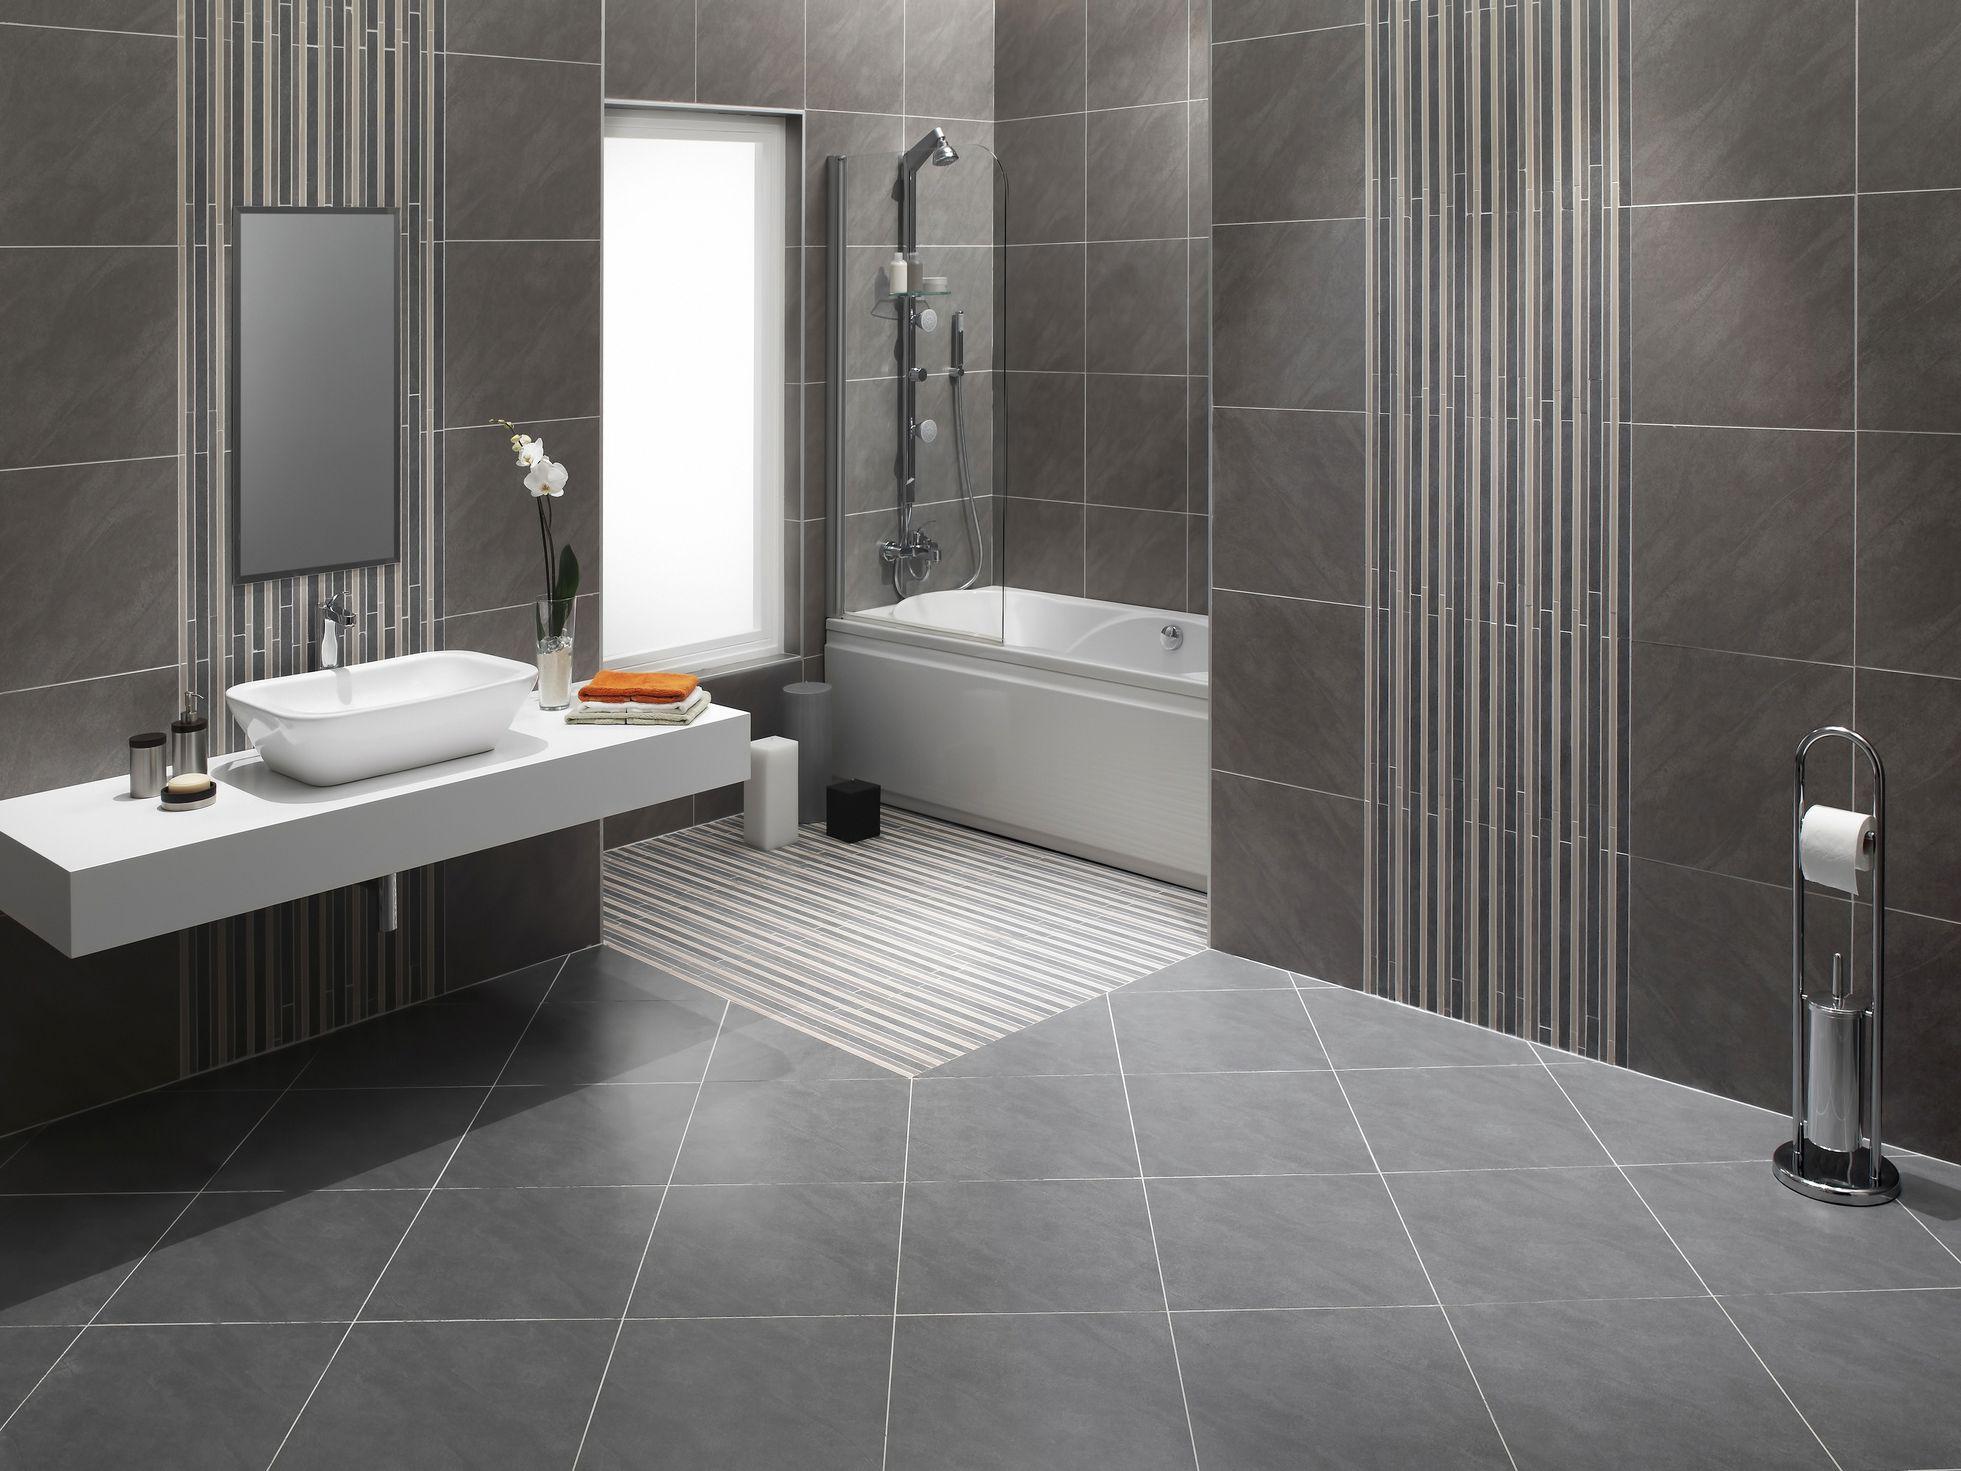 Basic Bathroom Design Rules